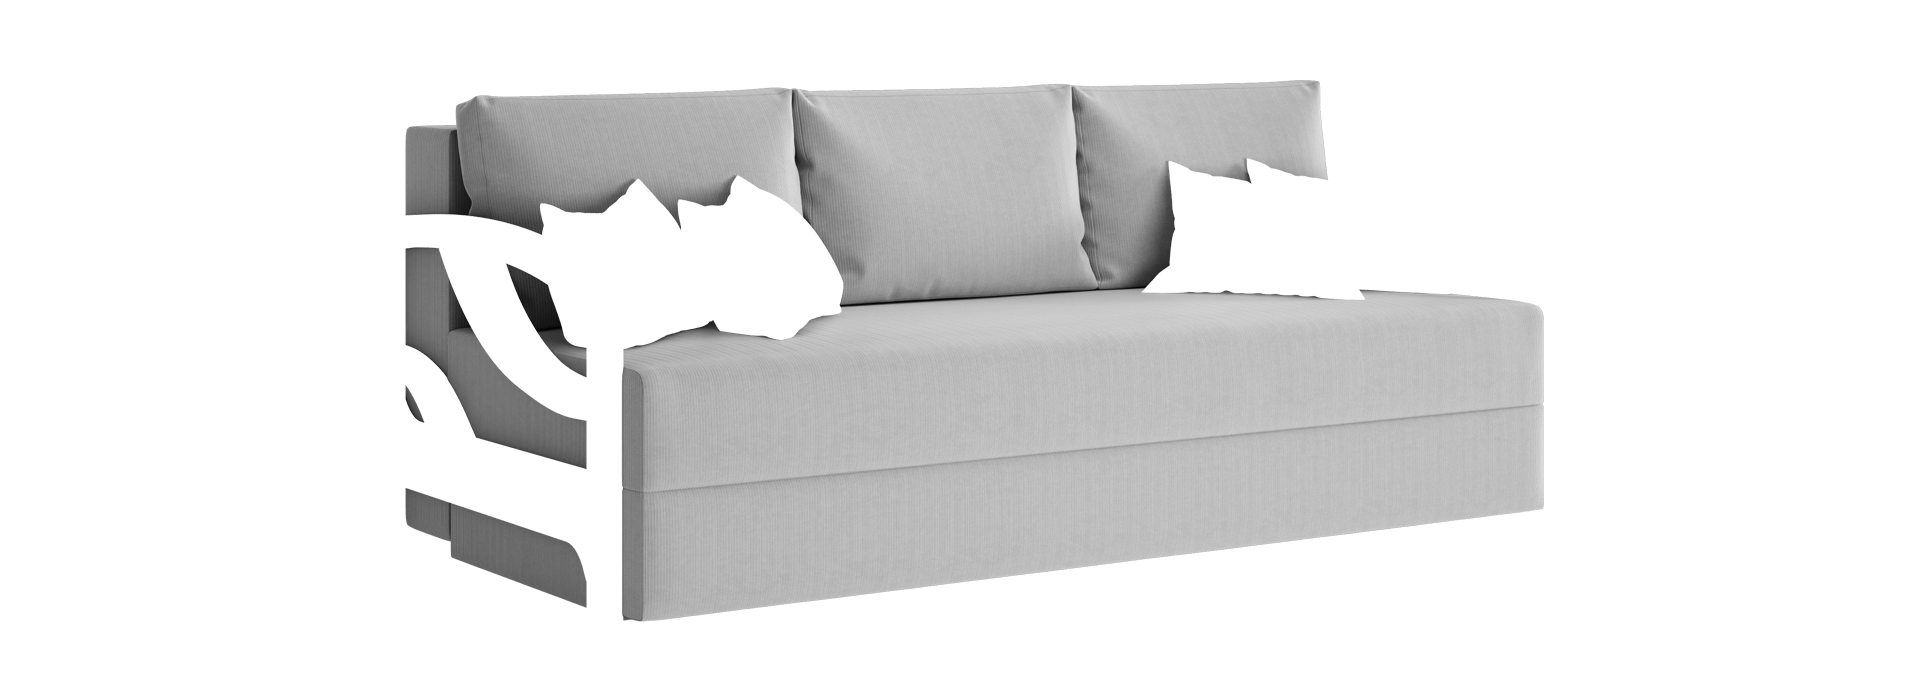 Ор-4 прямий диван - маска 2